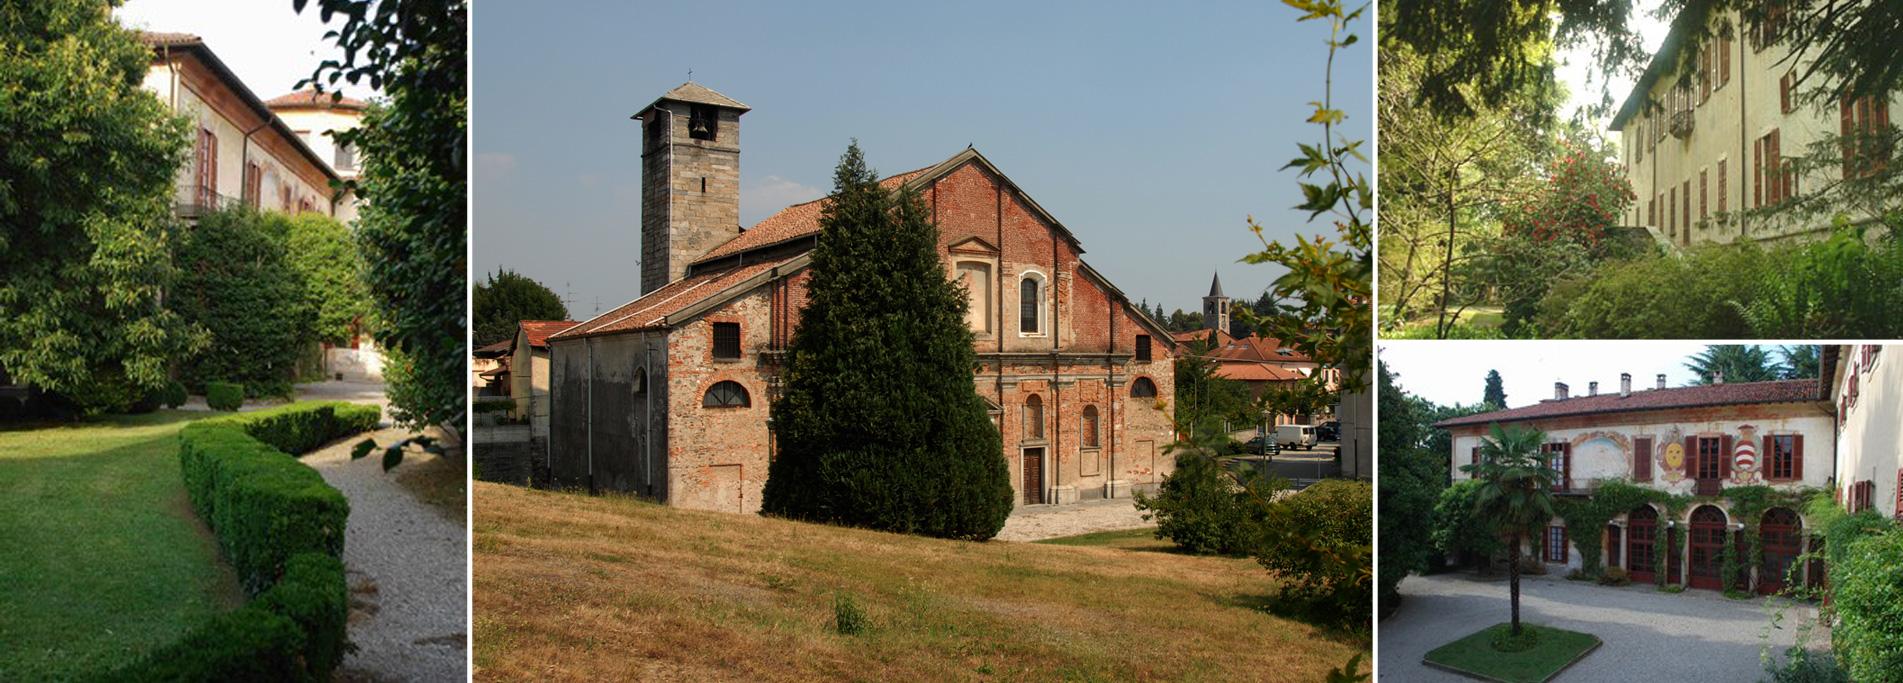 Varallo Pombia